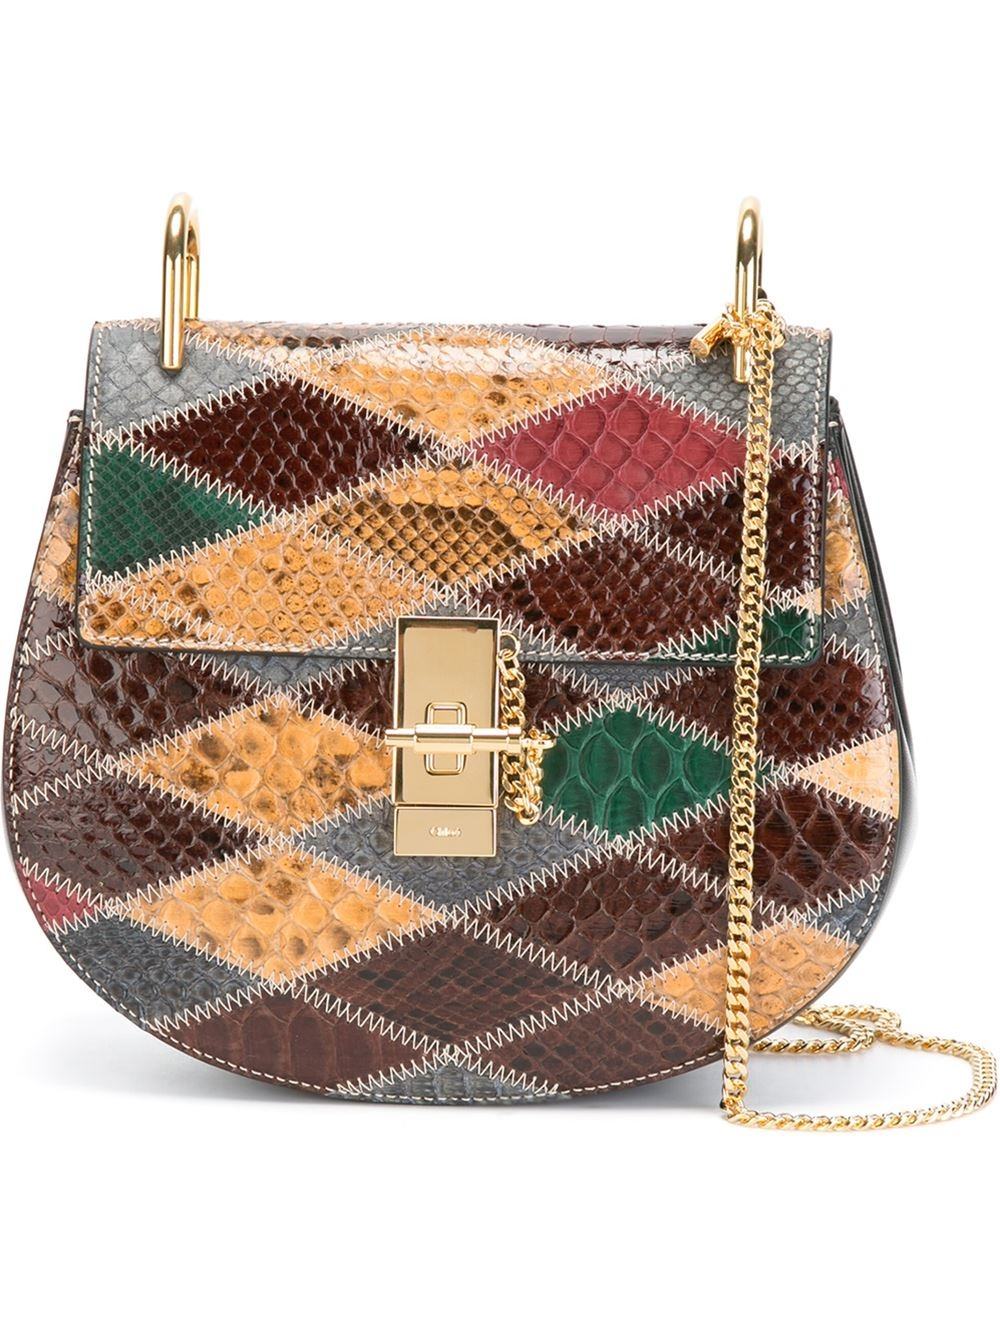 chloe handbags - Chlo�� Patchwork Drew Bag in Multicolor | Lyst